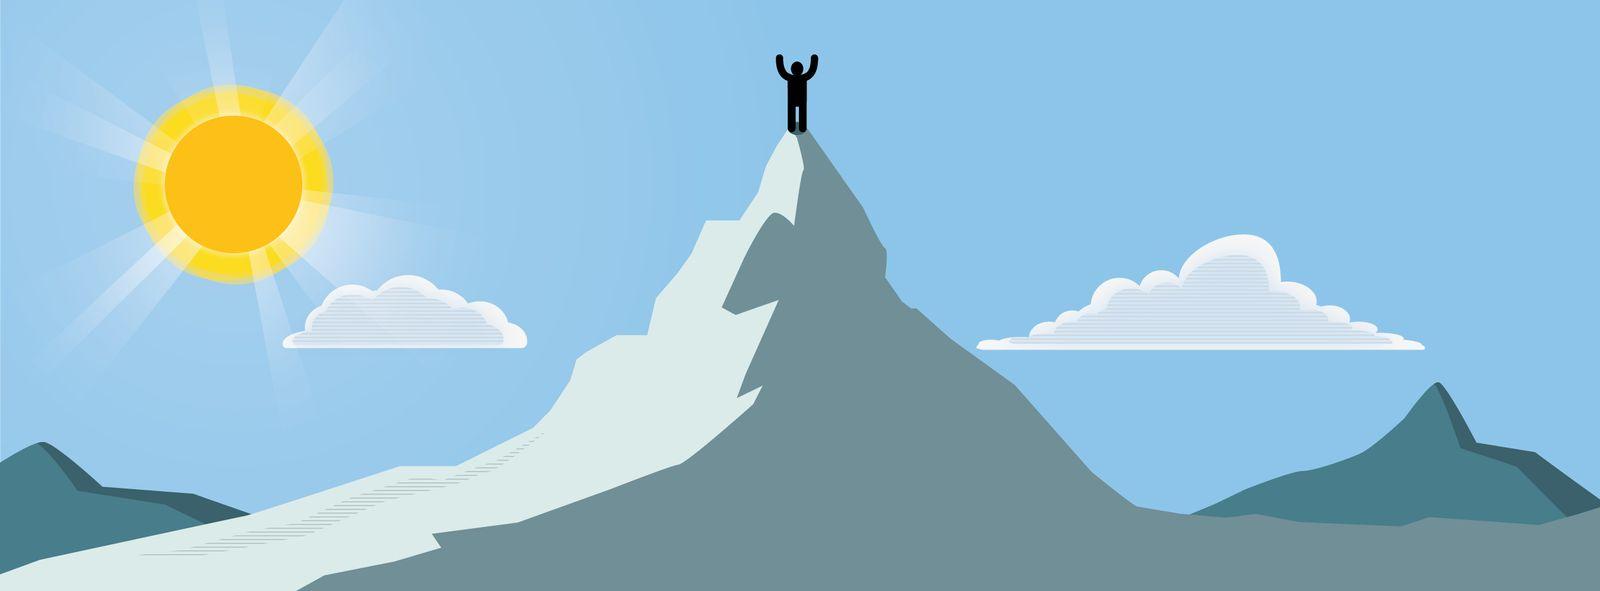 Rätsel der Woche Bergwndern v3